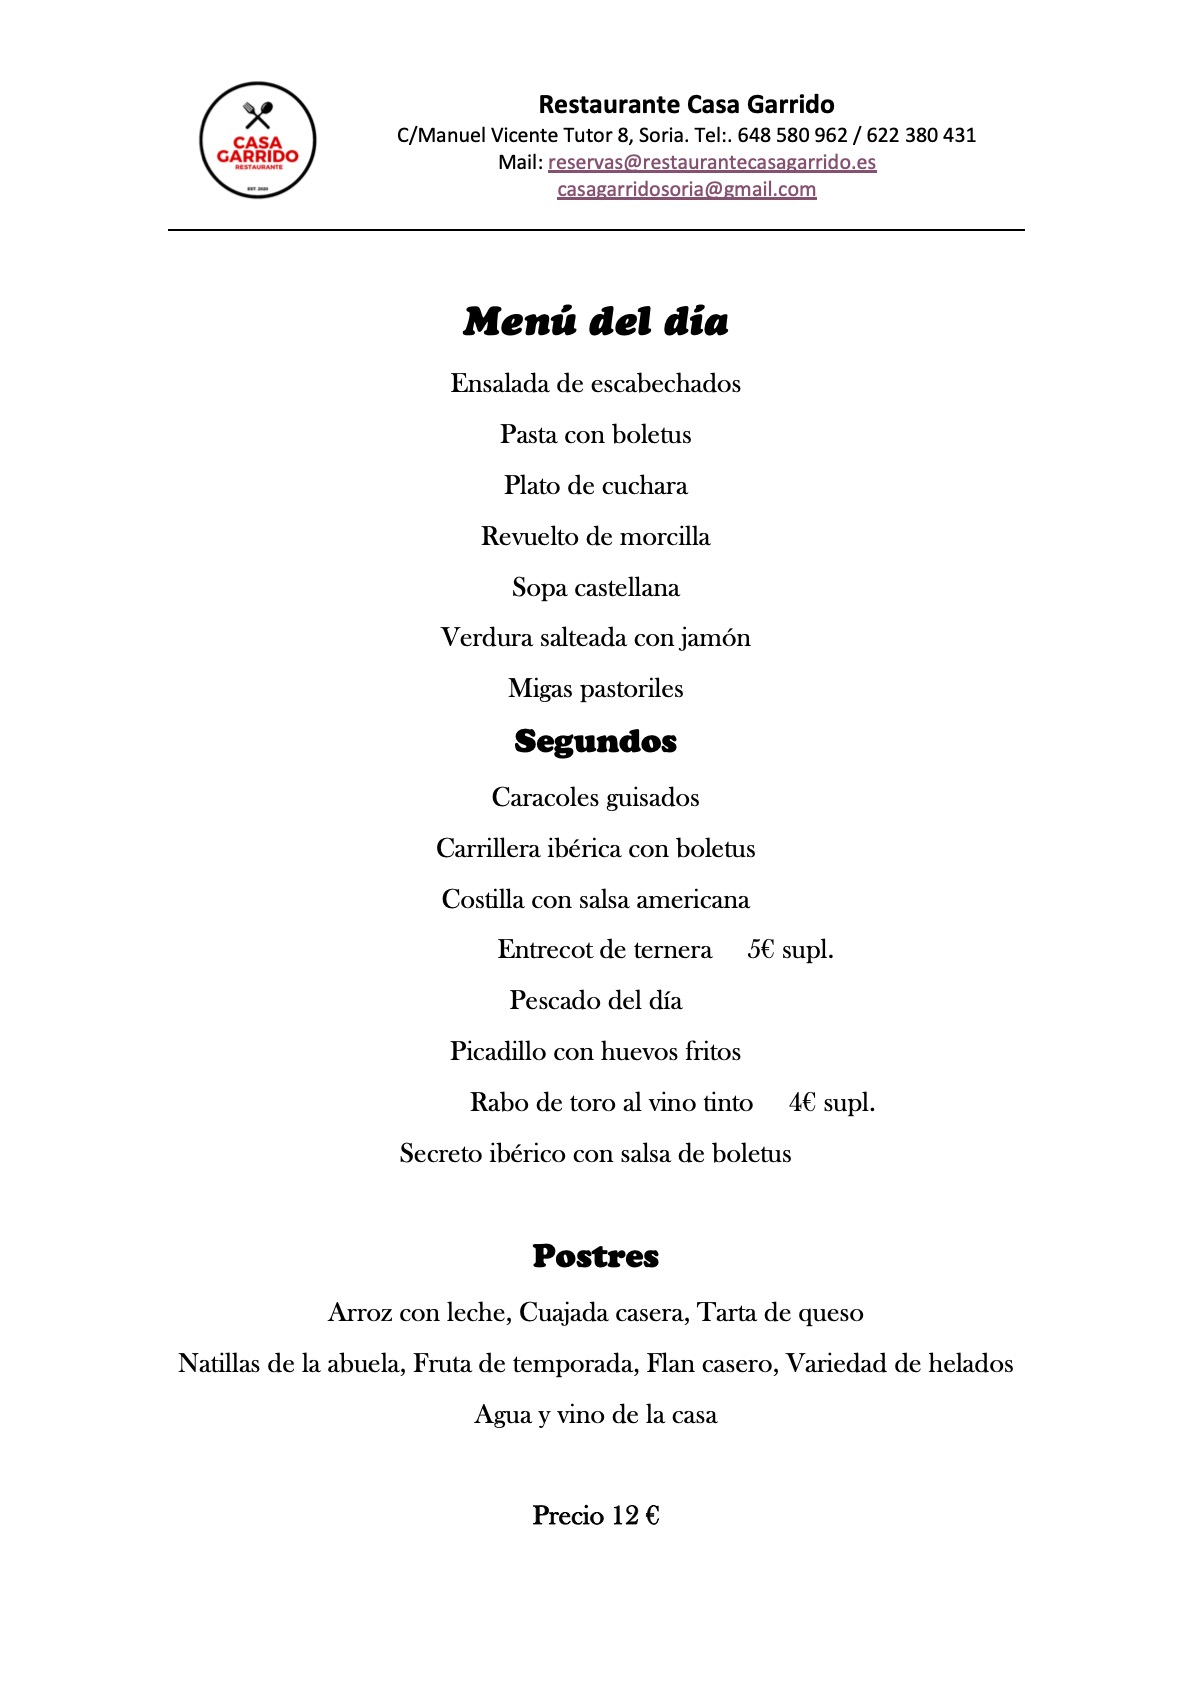 Carta-Completa-Casa-Garrido-2021-3_7bsdqe3u.jpg